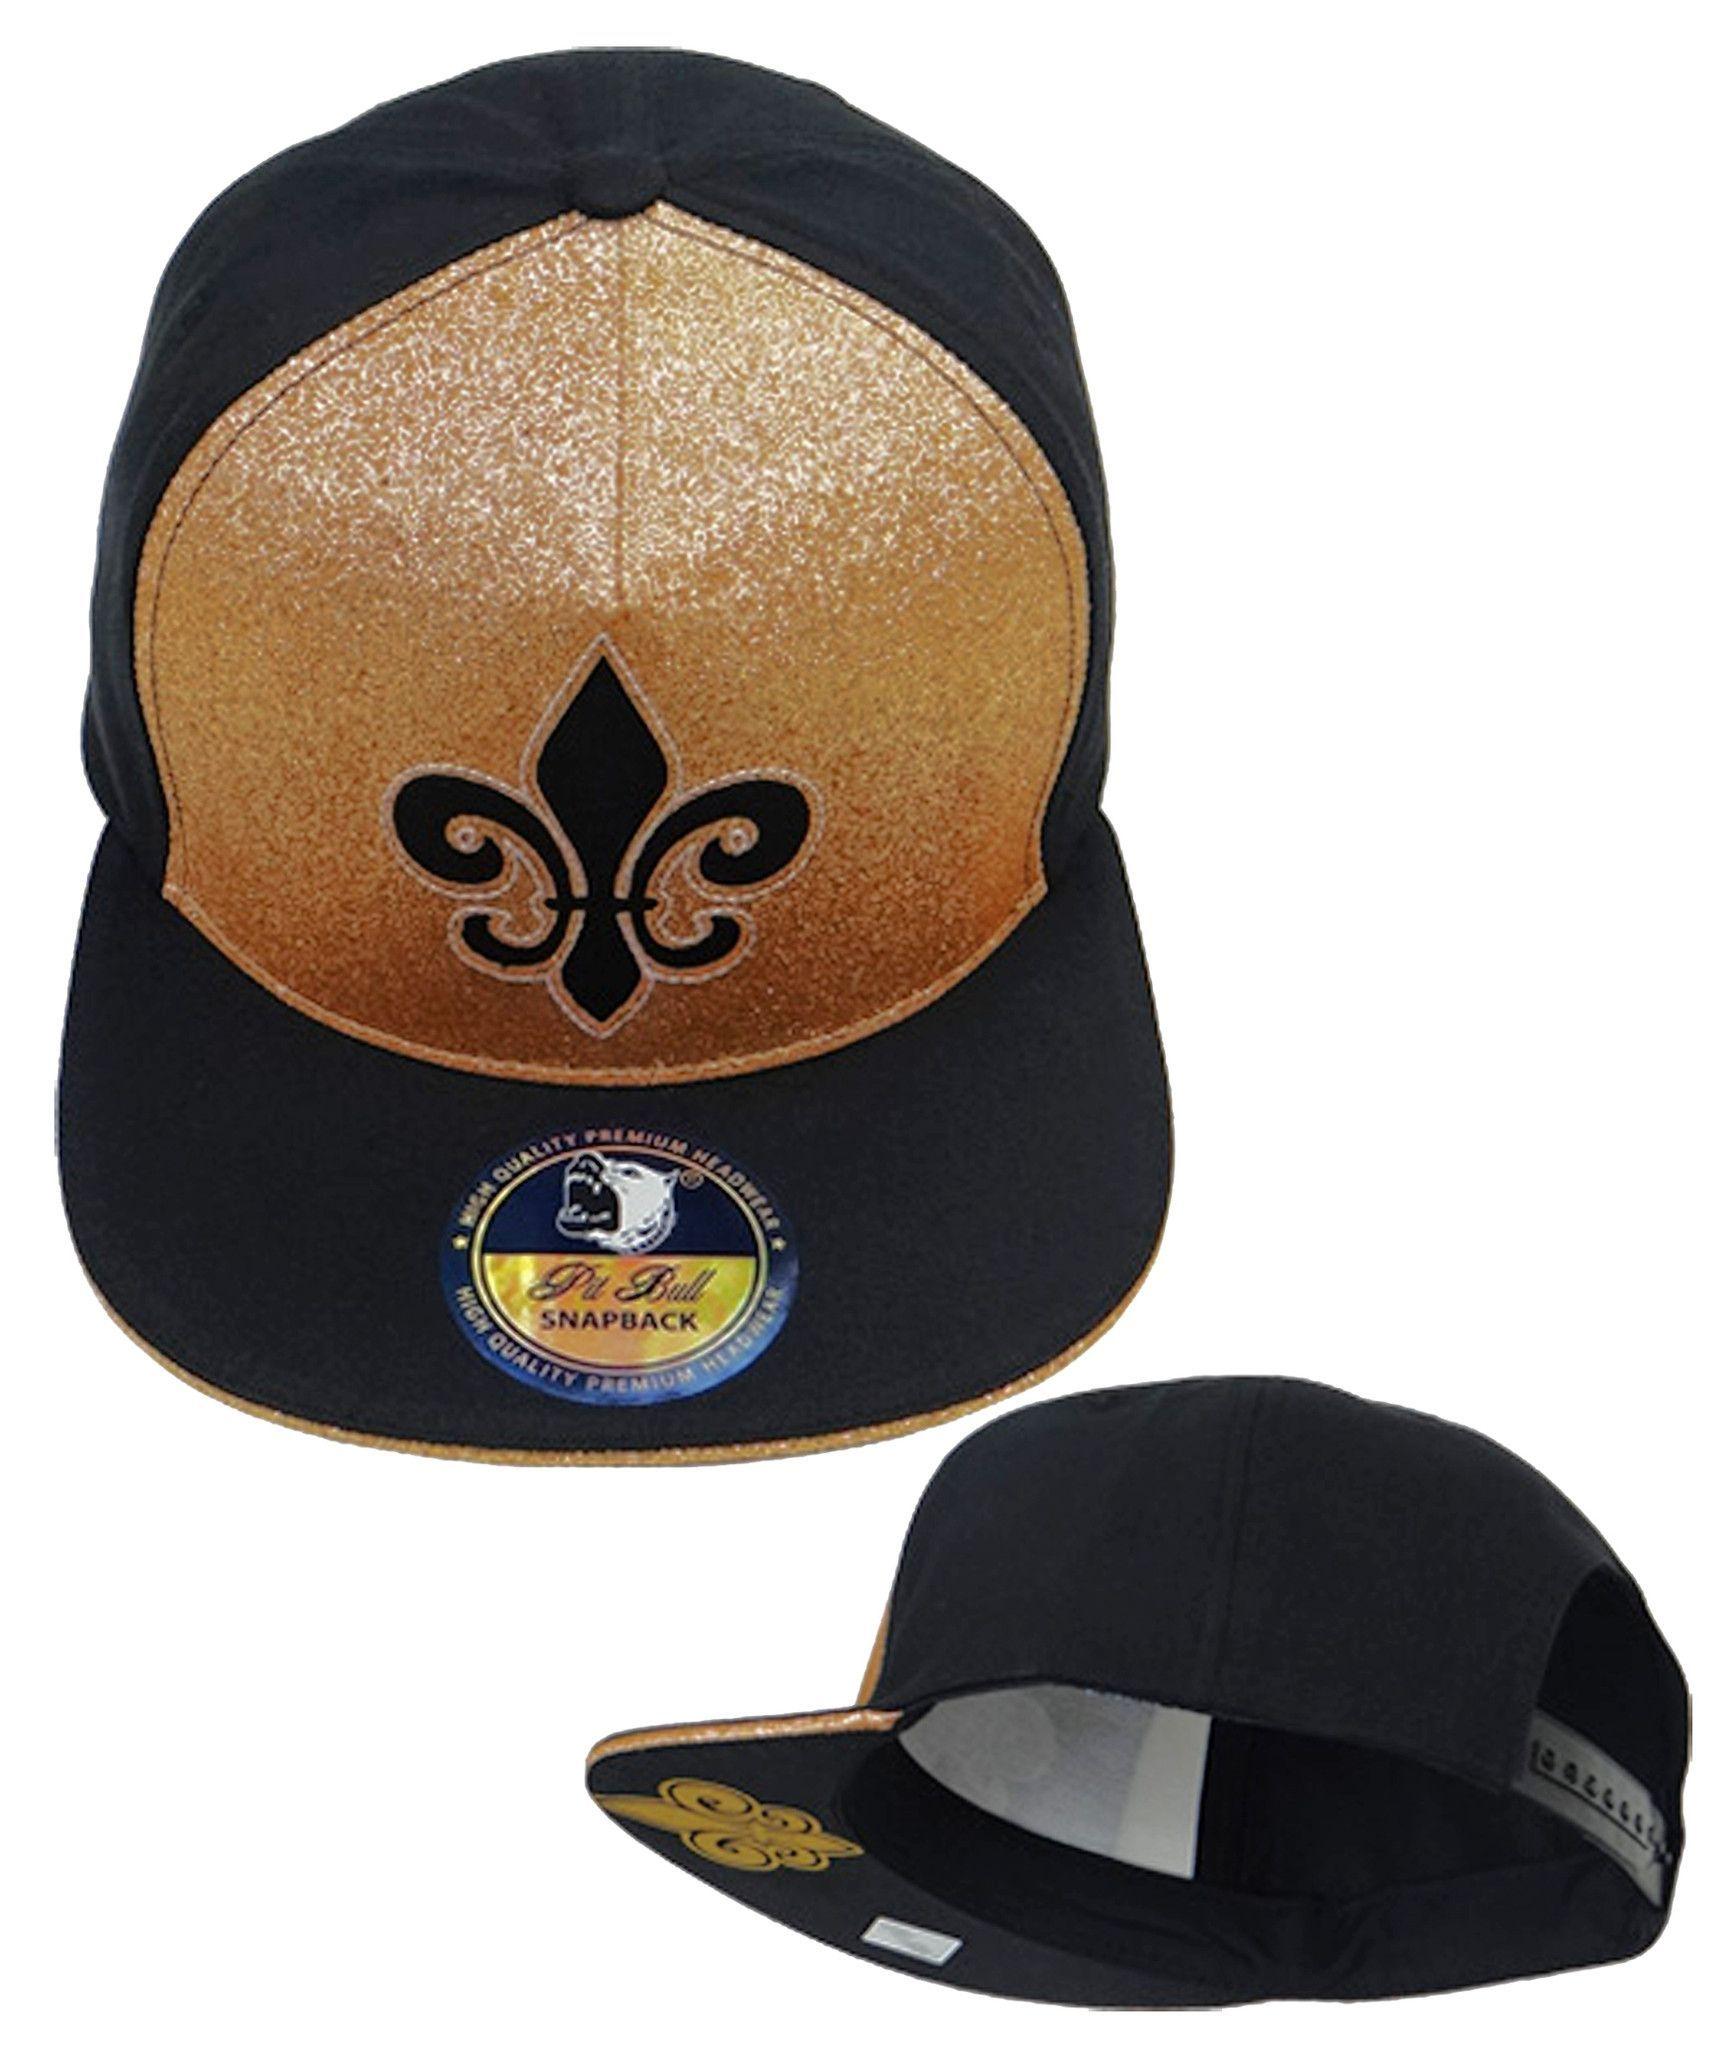 huge selection of 7424b 20a9f ... wholesale new orleans saints snapback hat fleur de lis baseball cap nfl  football team 44895 f5c6f